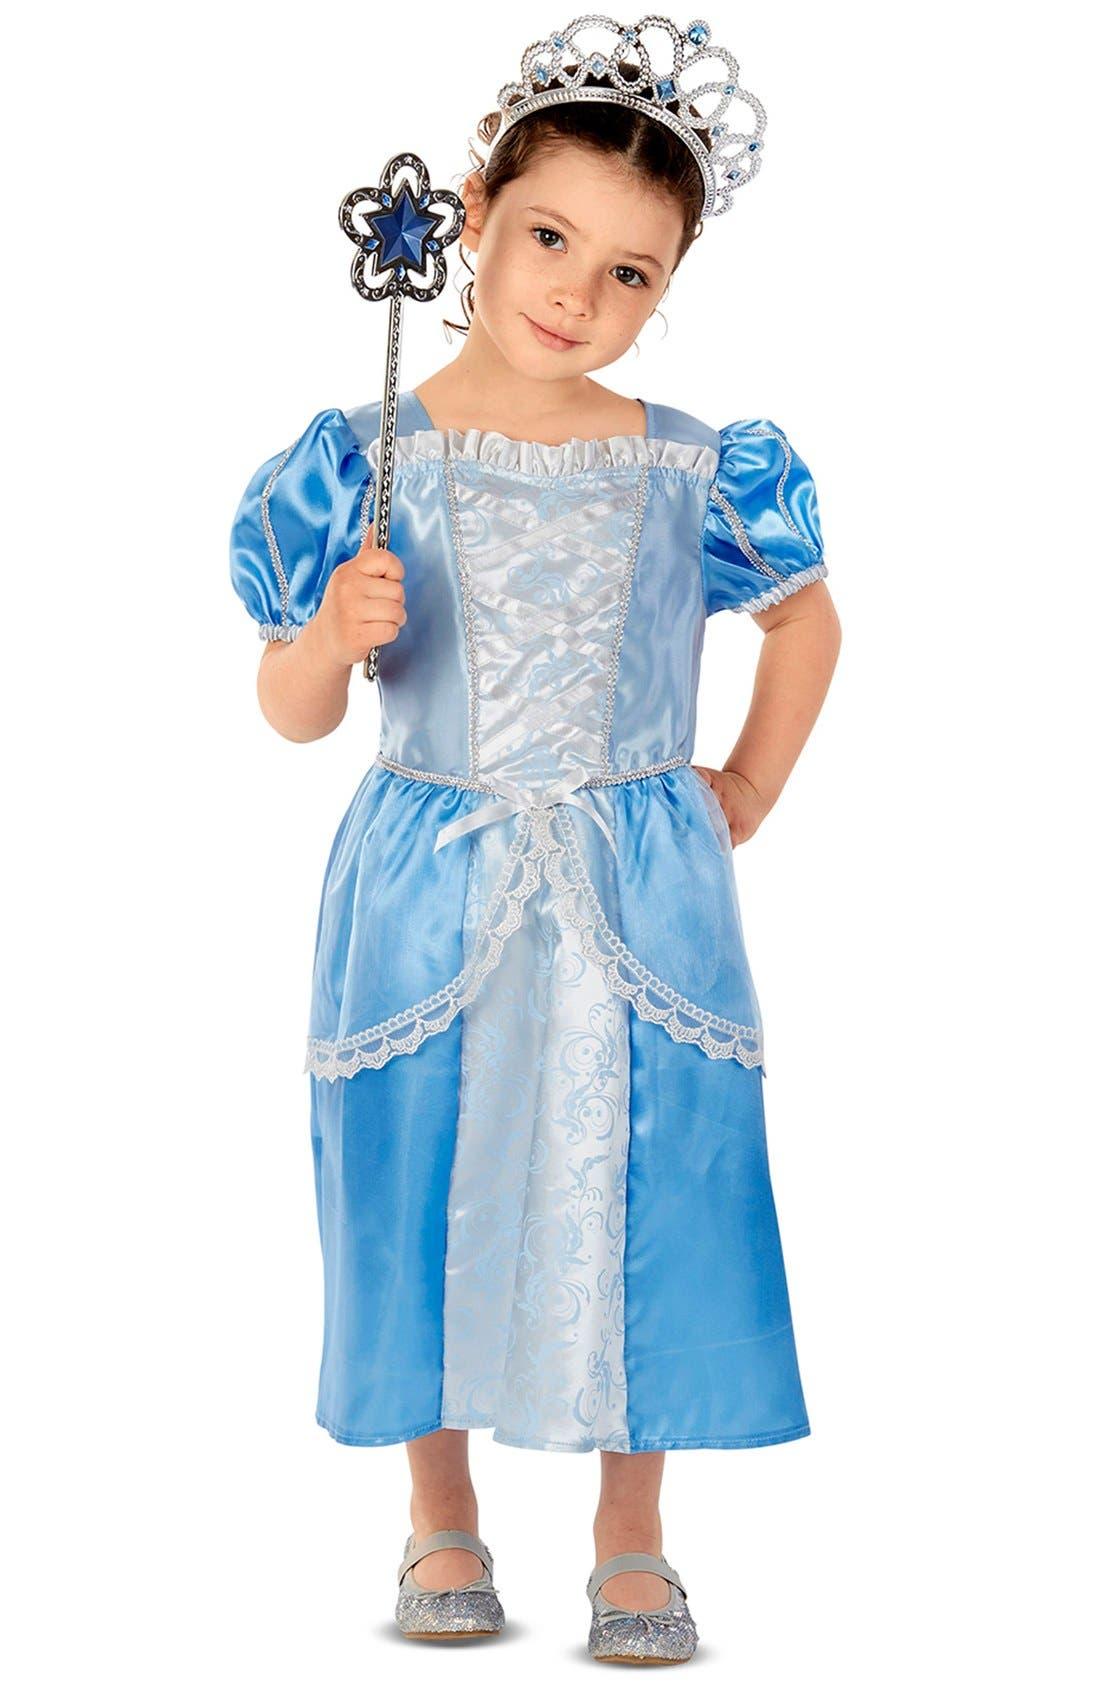 Royal Princess Role Play Set,                             Main thumbnail 1, color,                             BLUE